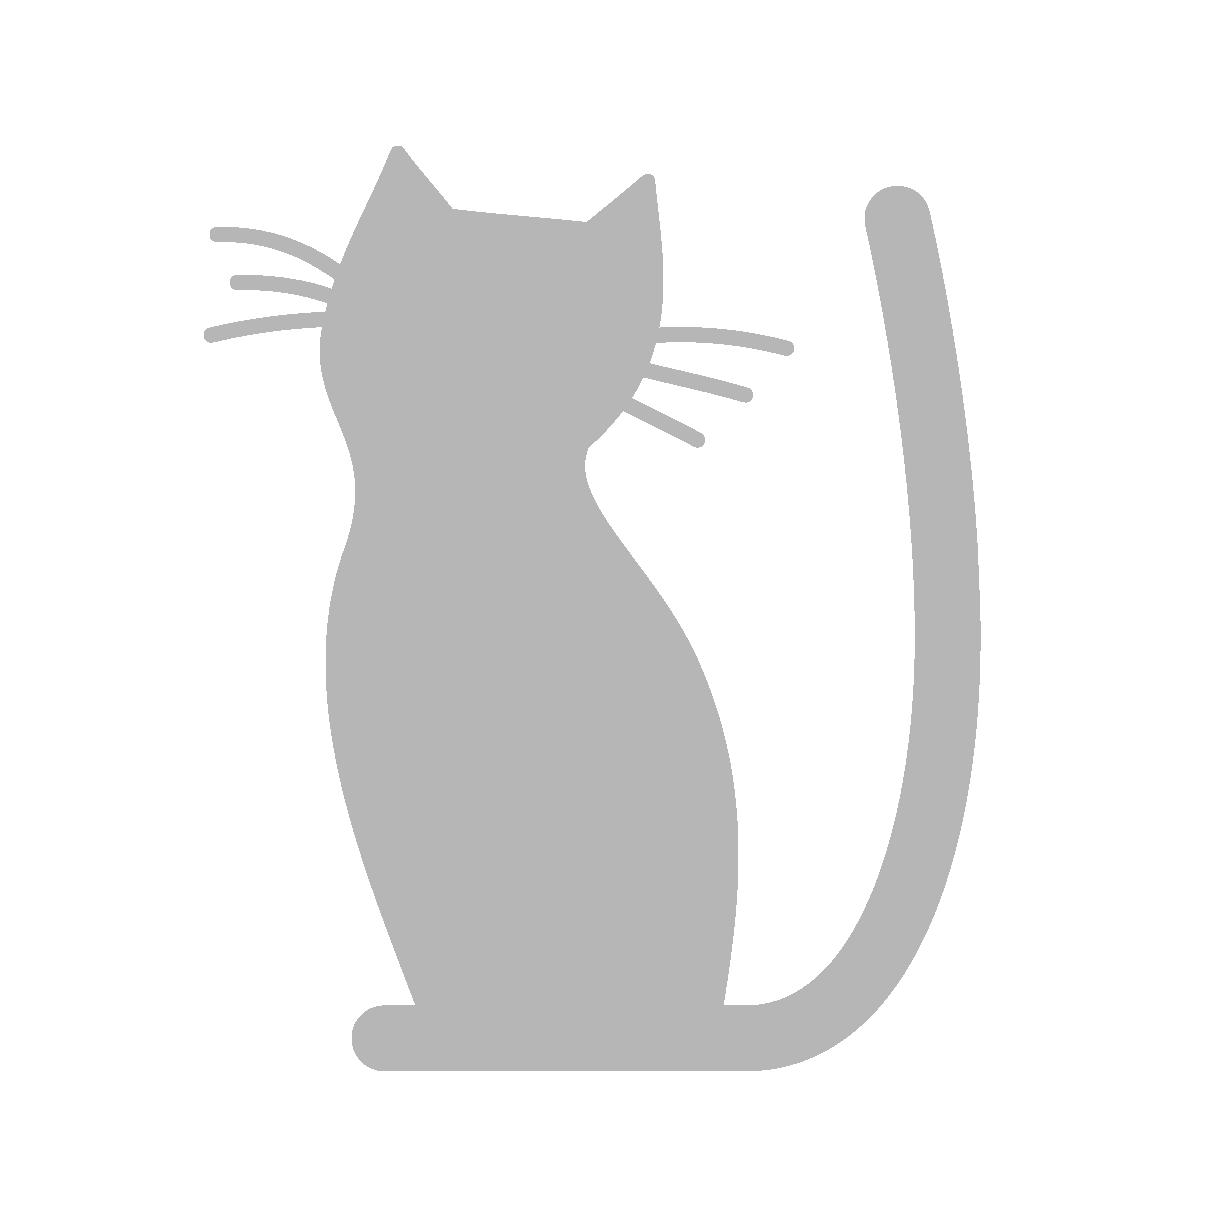 Kattentrimbus logo